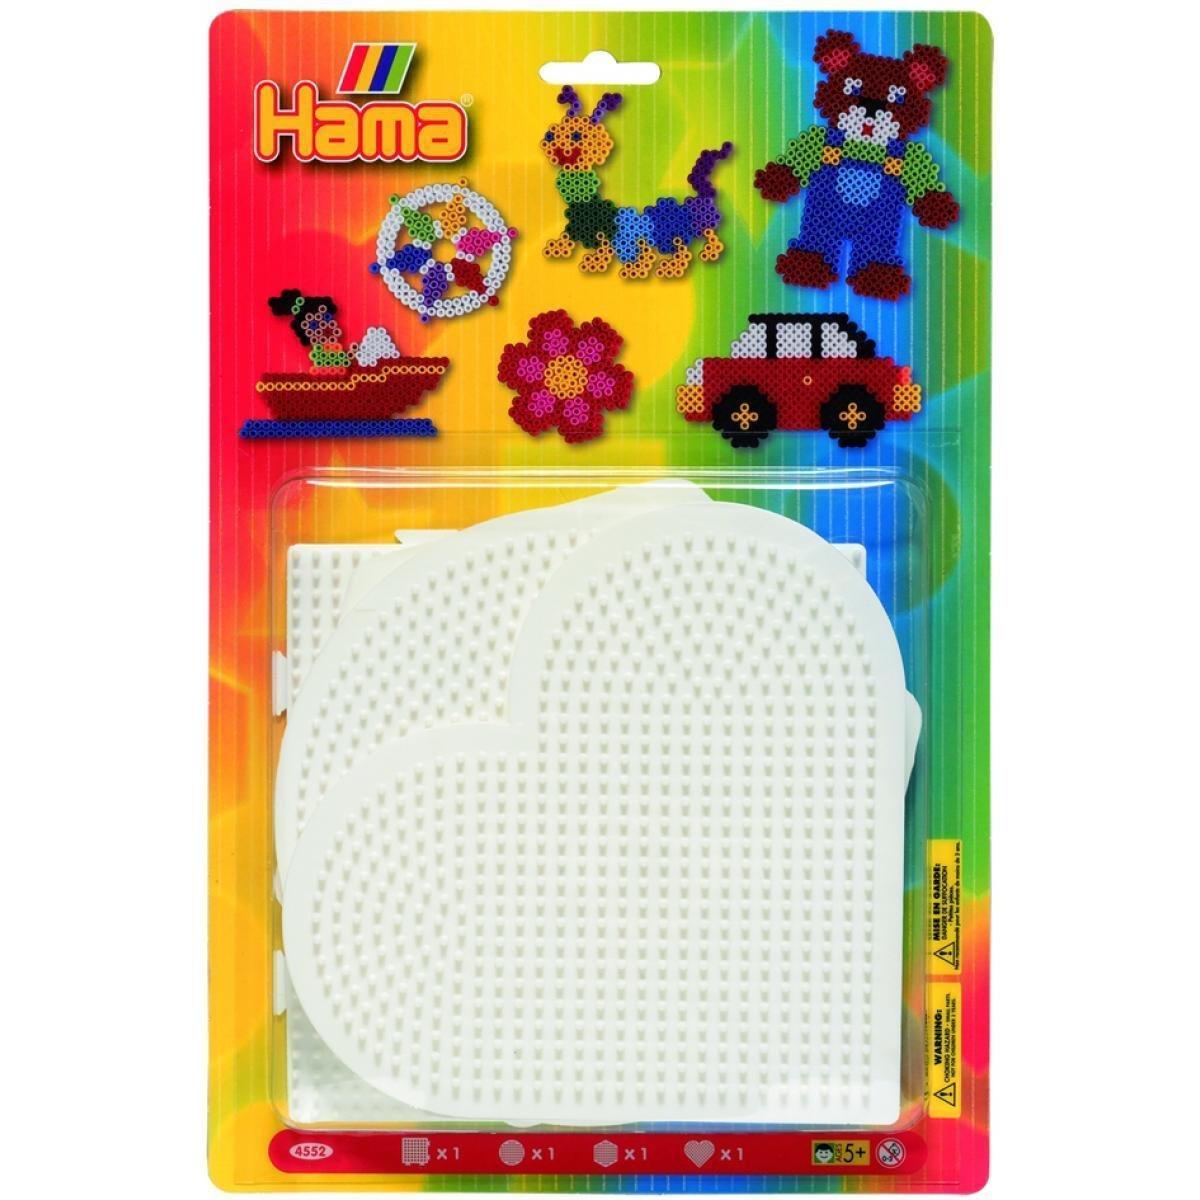 Large Hama Bead Boards Heart Square Round Hexagonal Star Peg Board